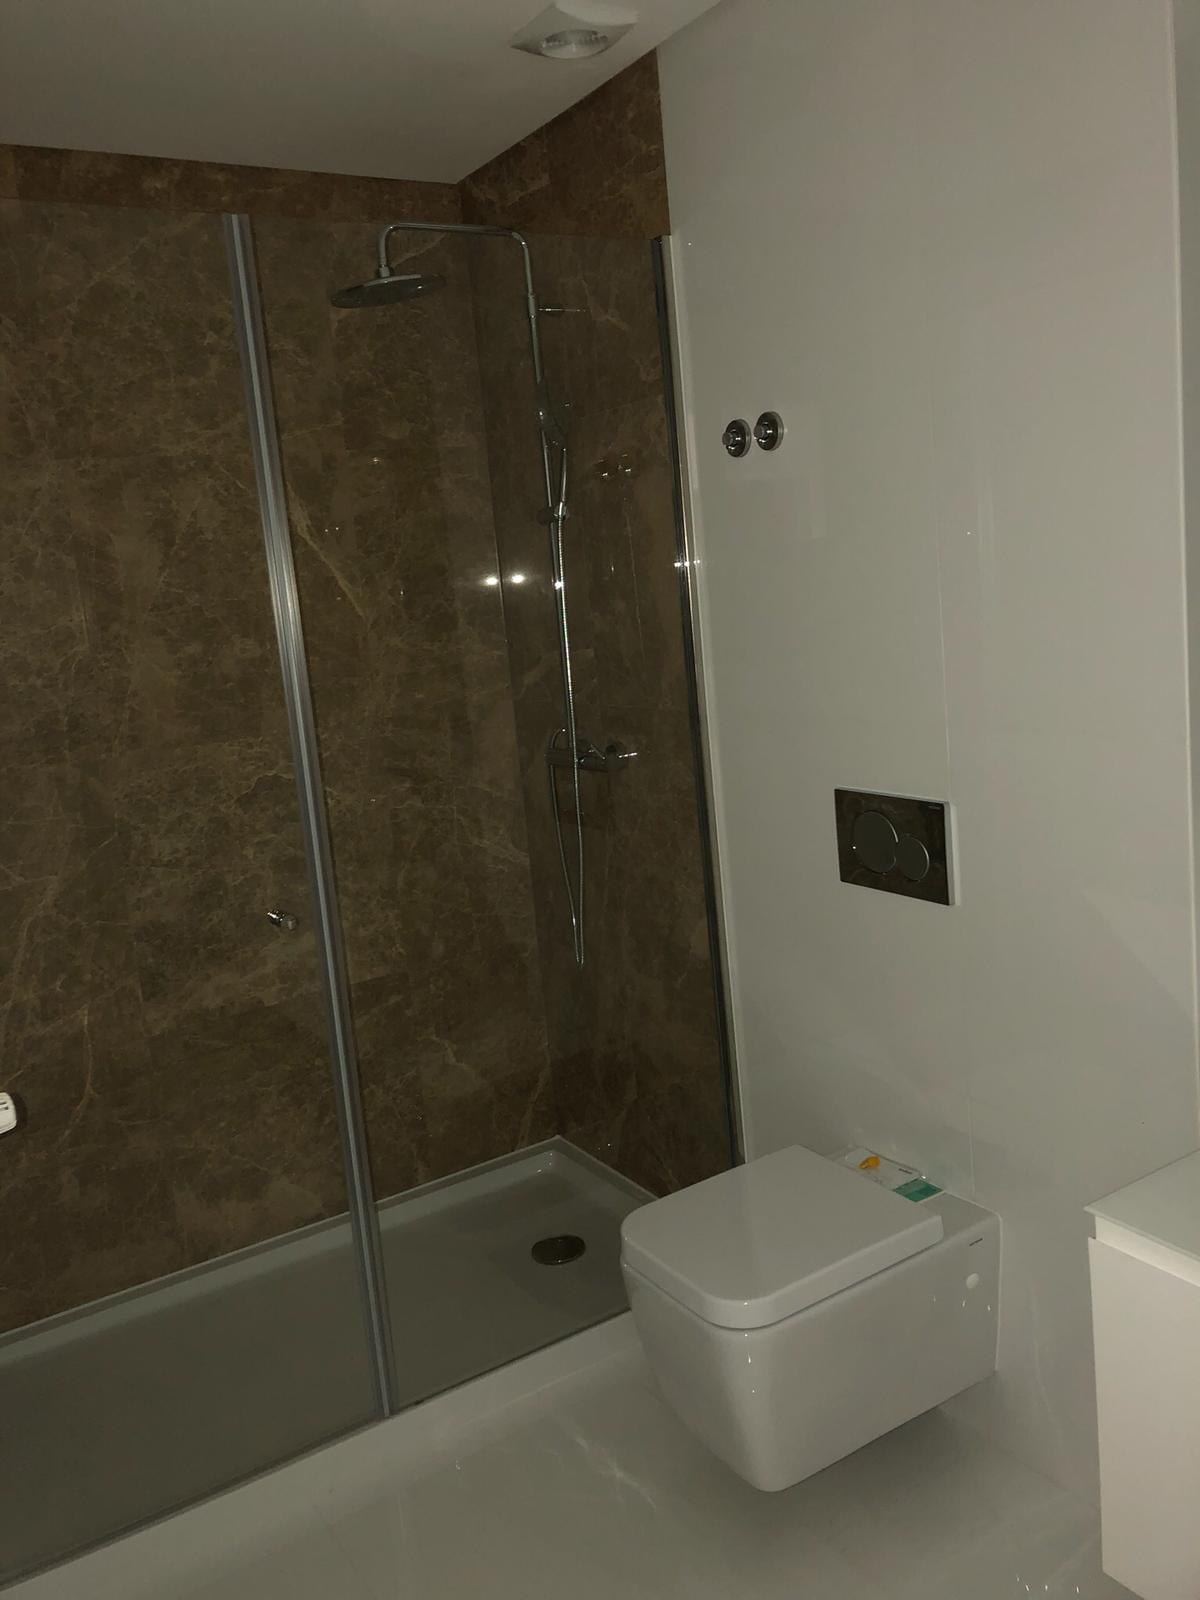 pf18232-apartamento-t2-lisboa-98b8d4e0-a927-474f-8564-01a1dbd25e50